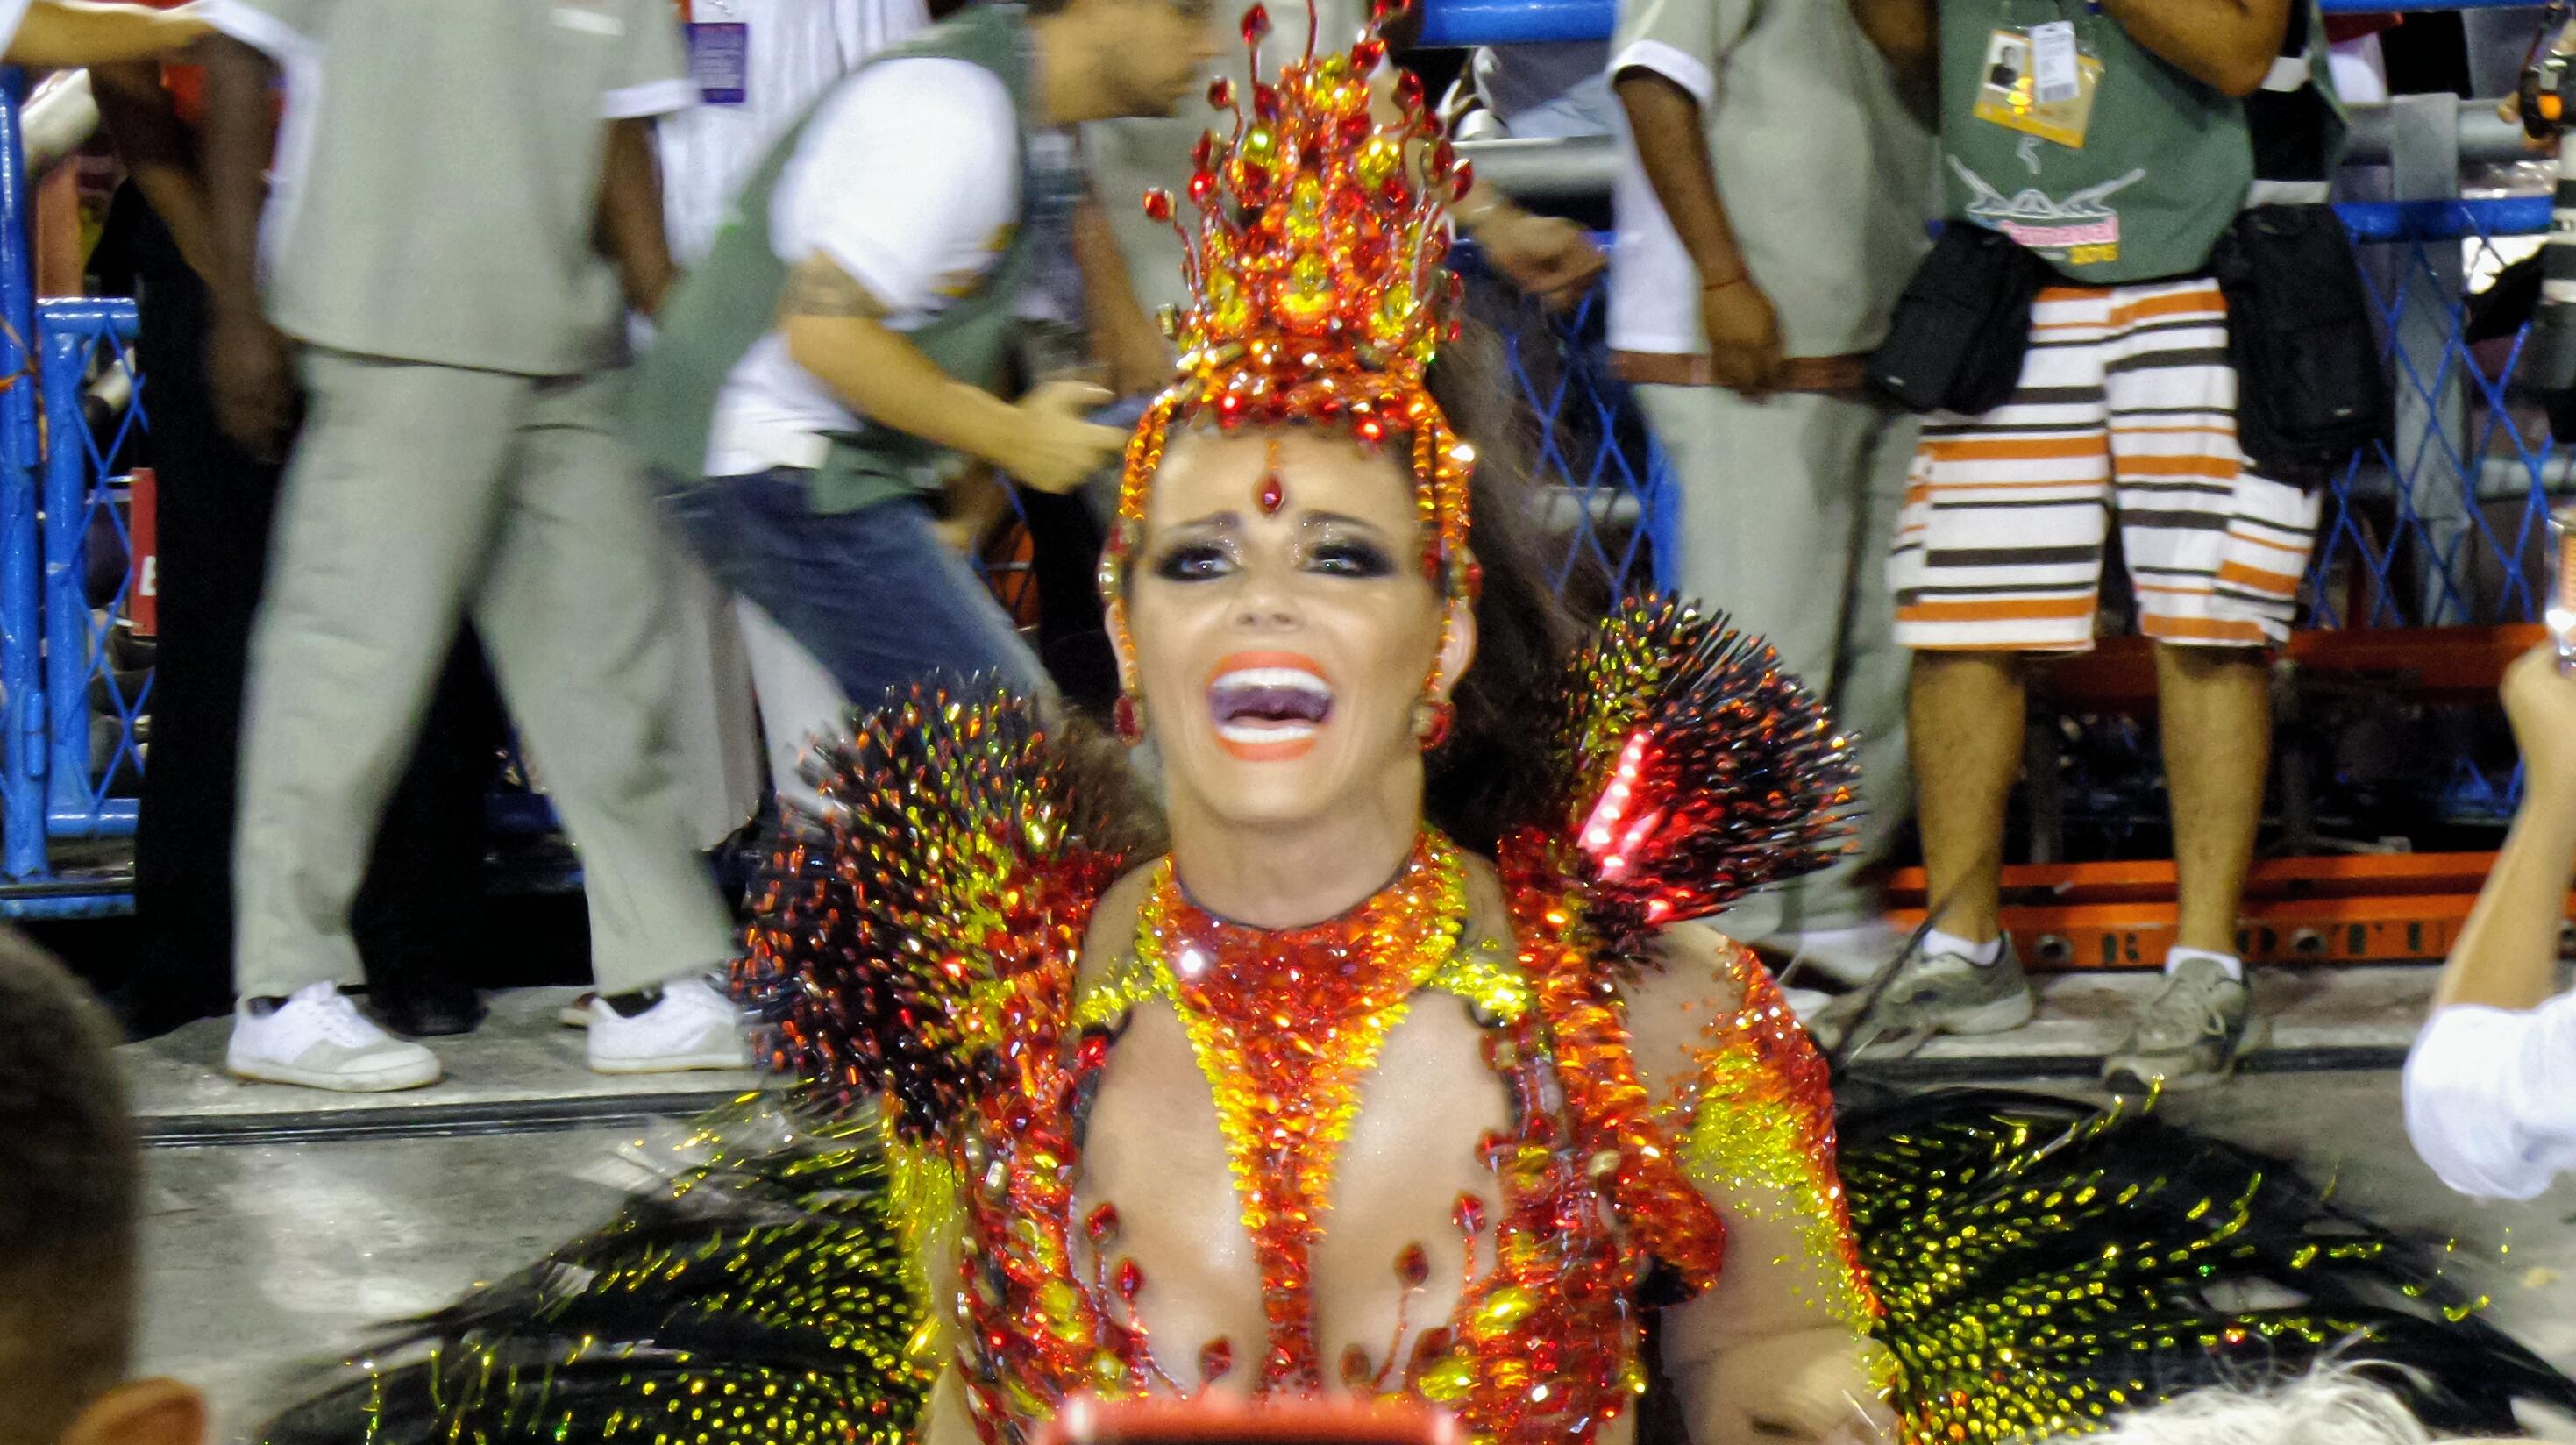 Viviane araujo madrinha bateria salgueiro 2015 grande carnaval rio sapucai